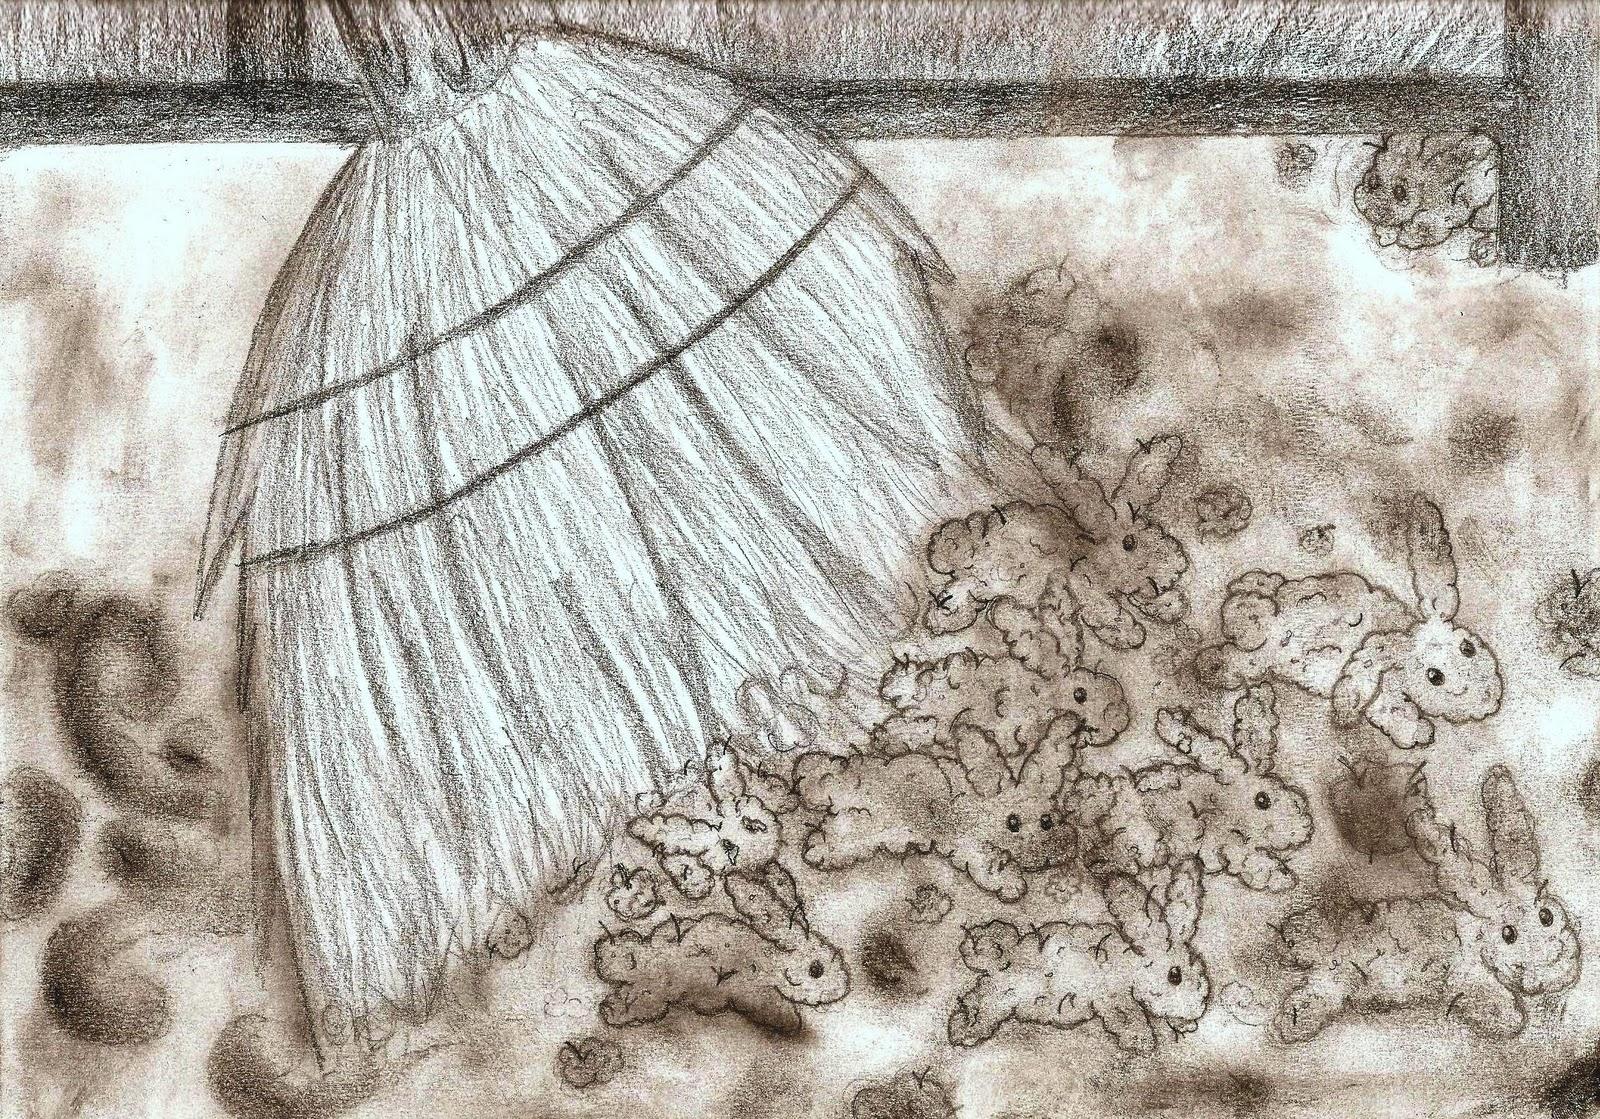 Kristina S Wonderland Of Art My First Sketchbook